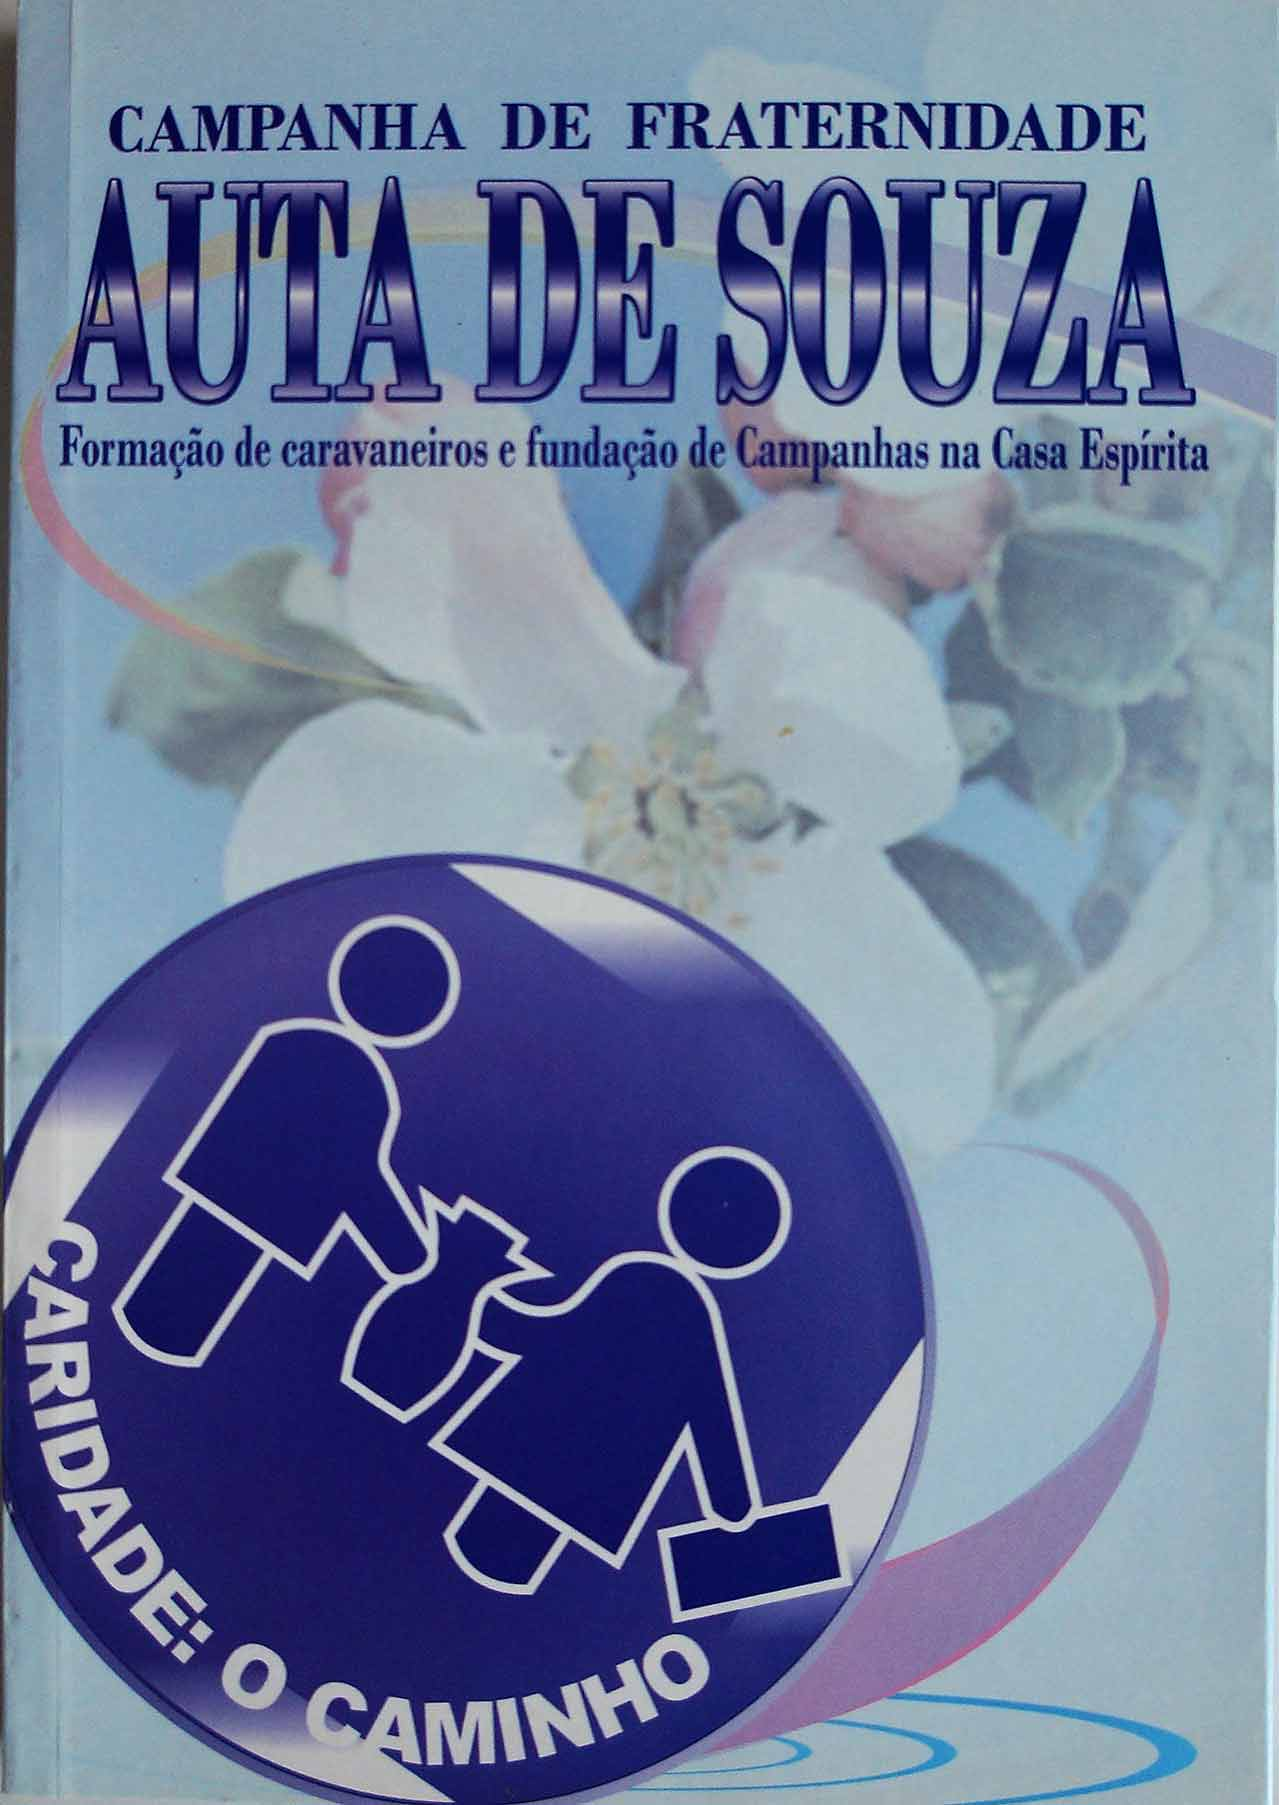 CAMPANHA DE FRATERNIDADE AUTA DE SOUZA